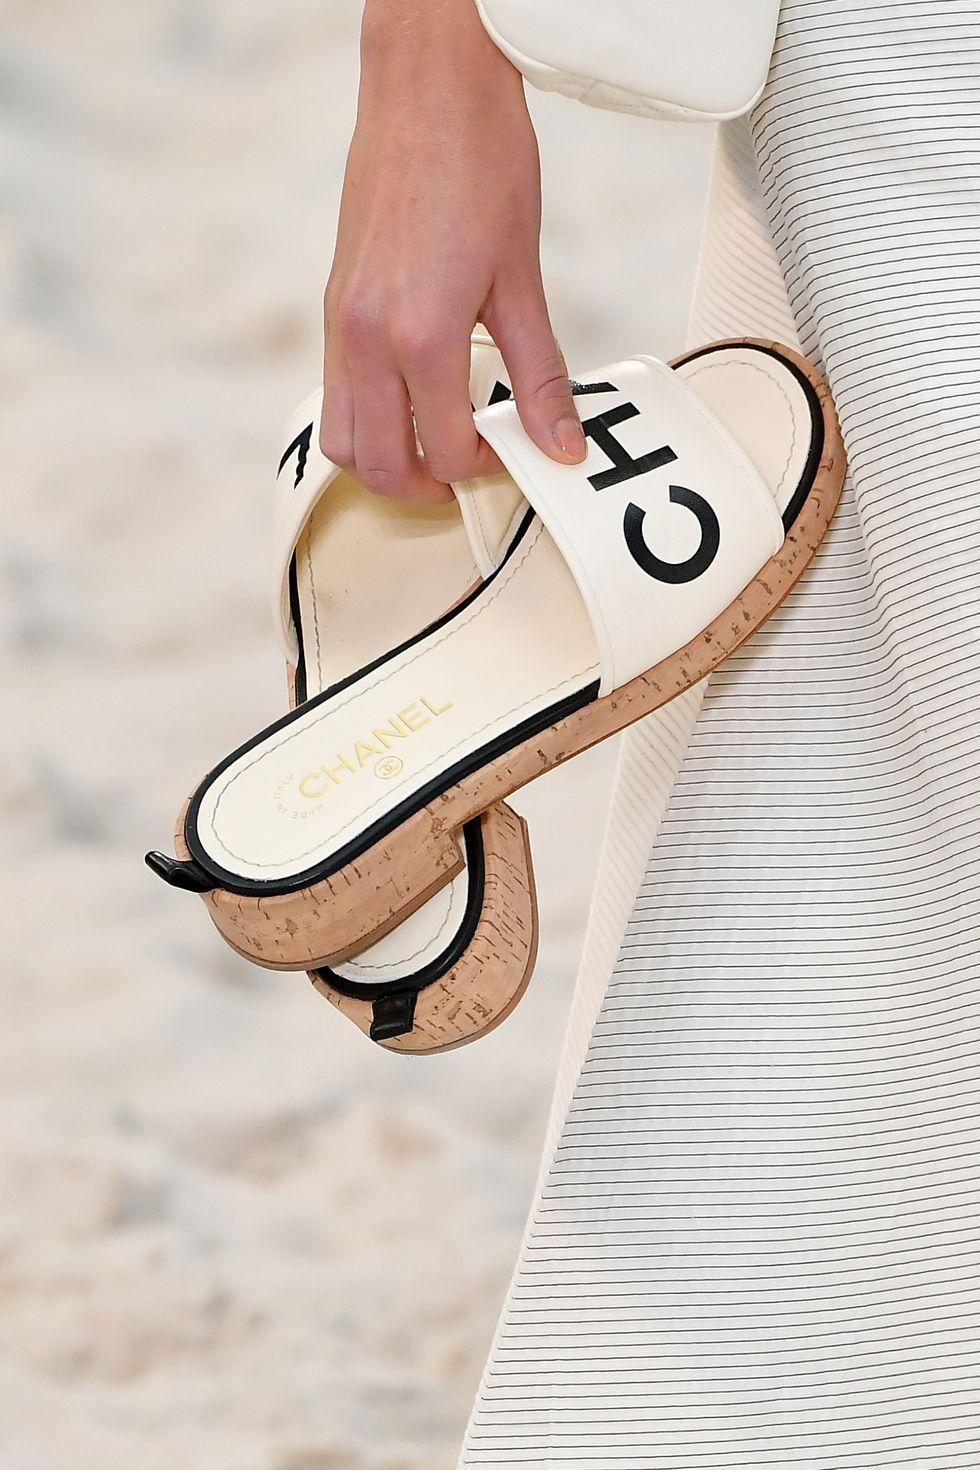 gabriela peregrina_strutting my style_shoes 2019_logomania_chanel.jpg